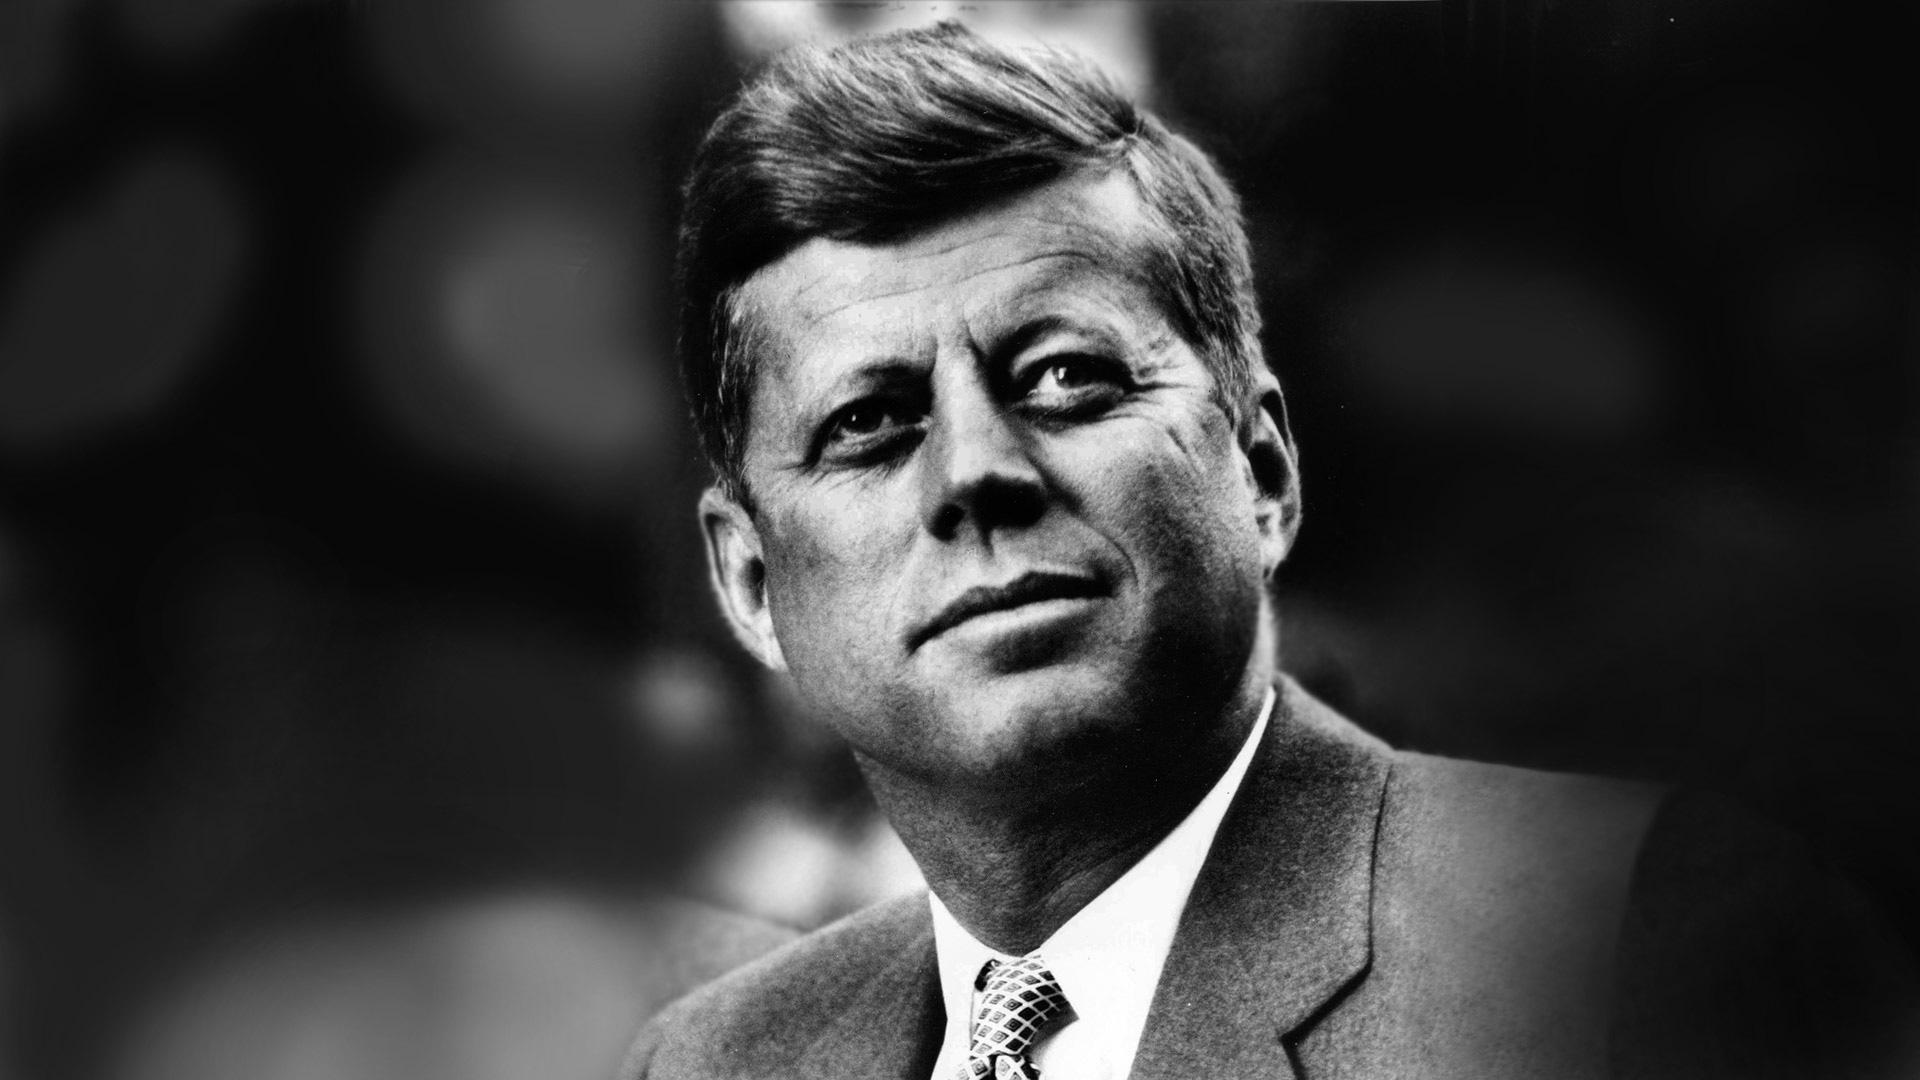 Se cumplen 54 años del asesinato de John F. Kennedy